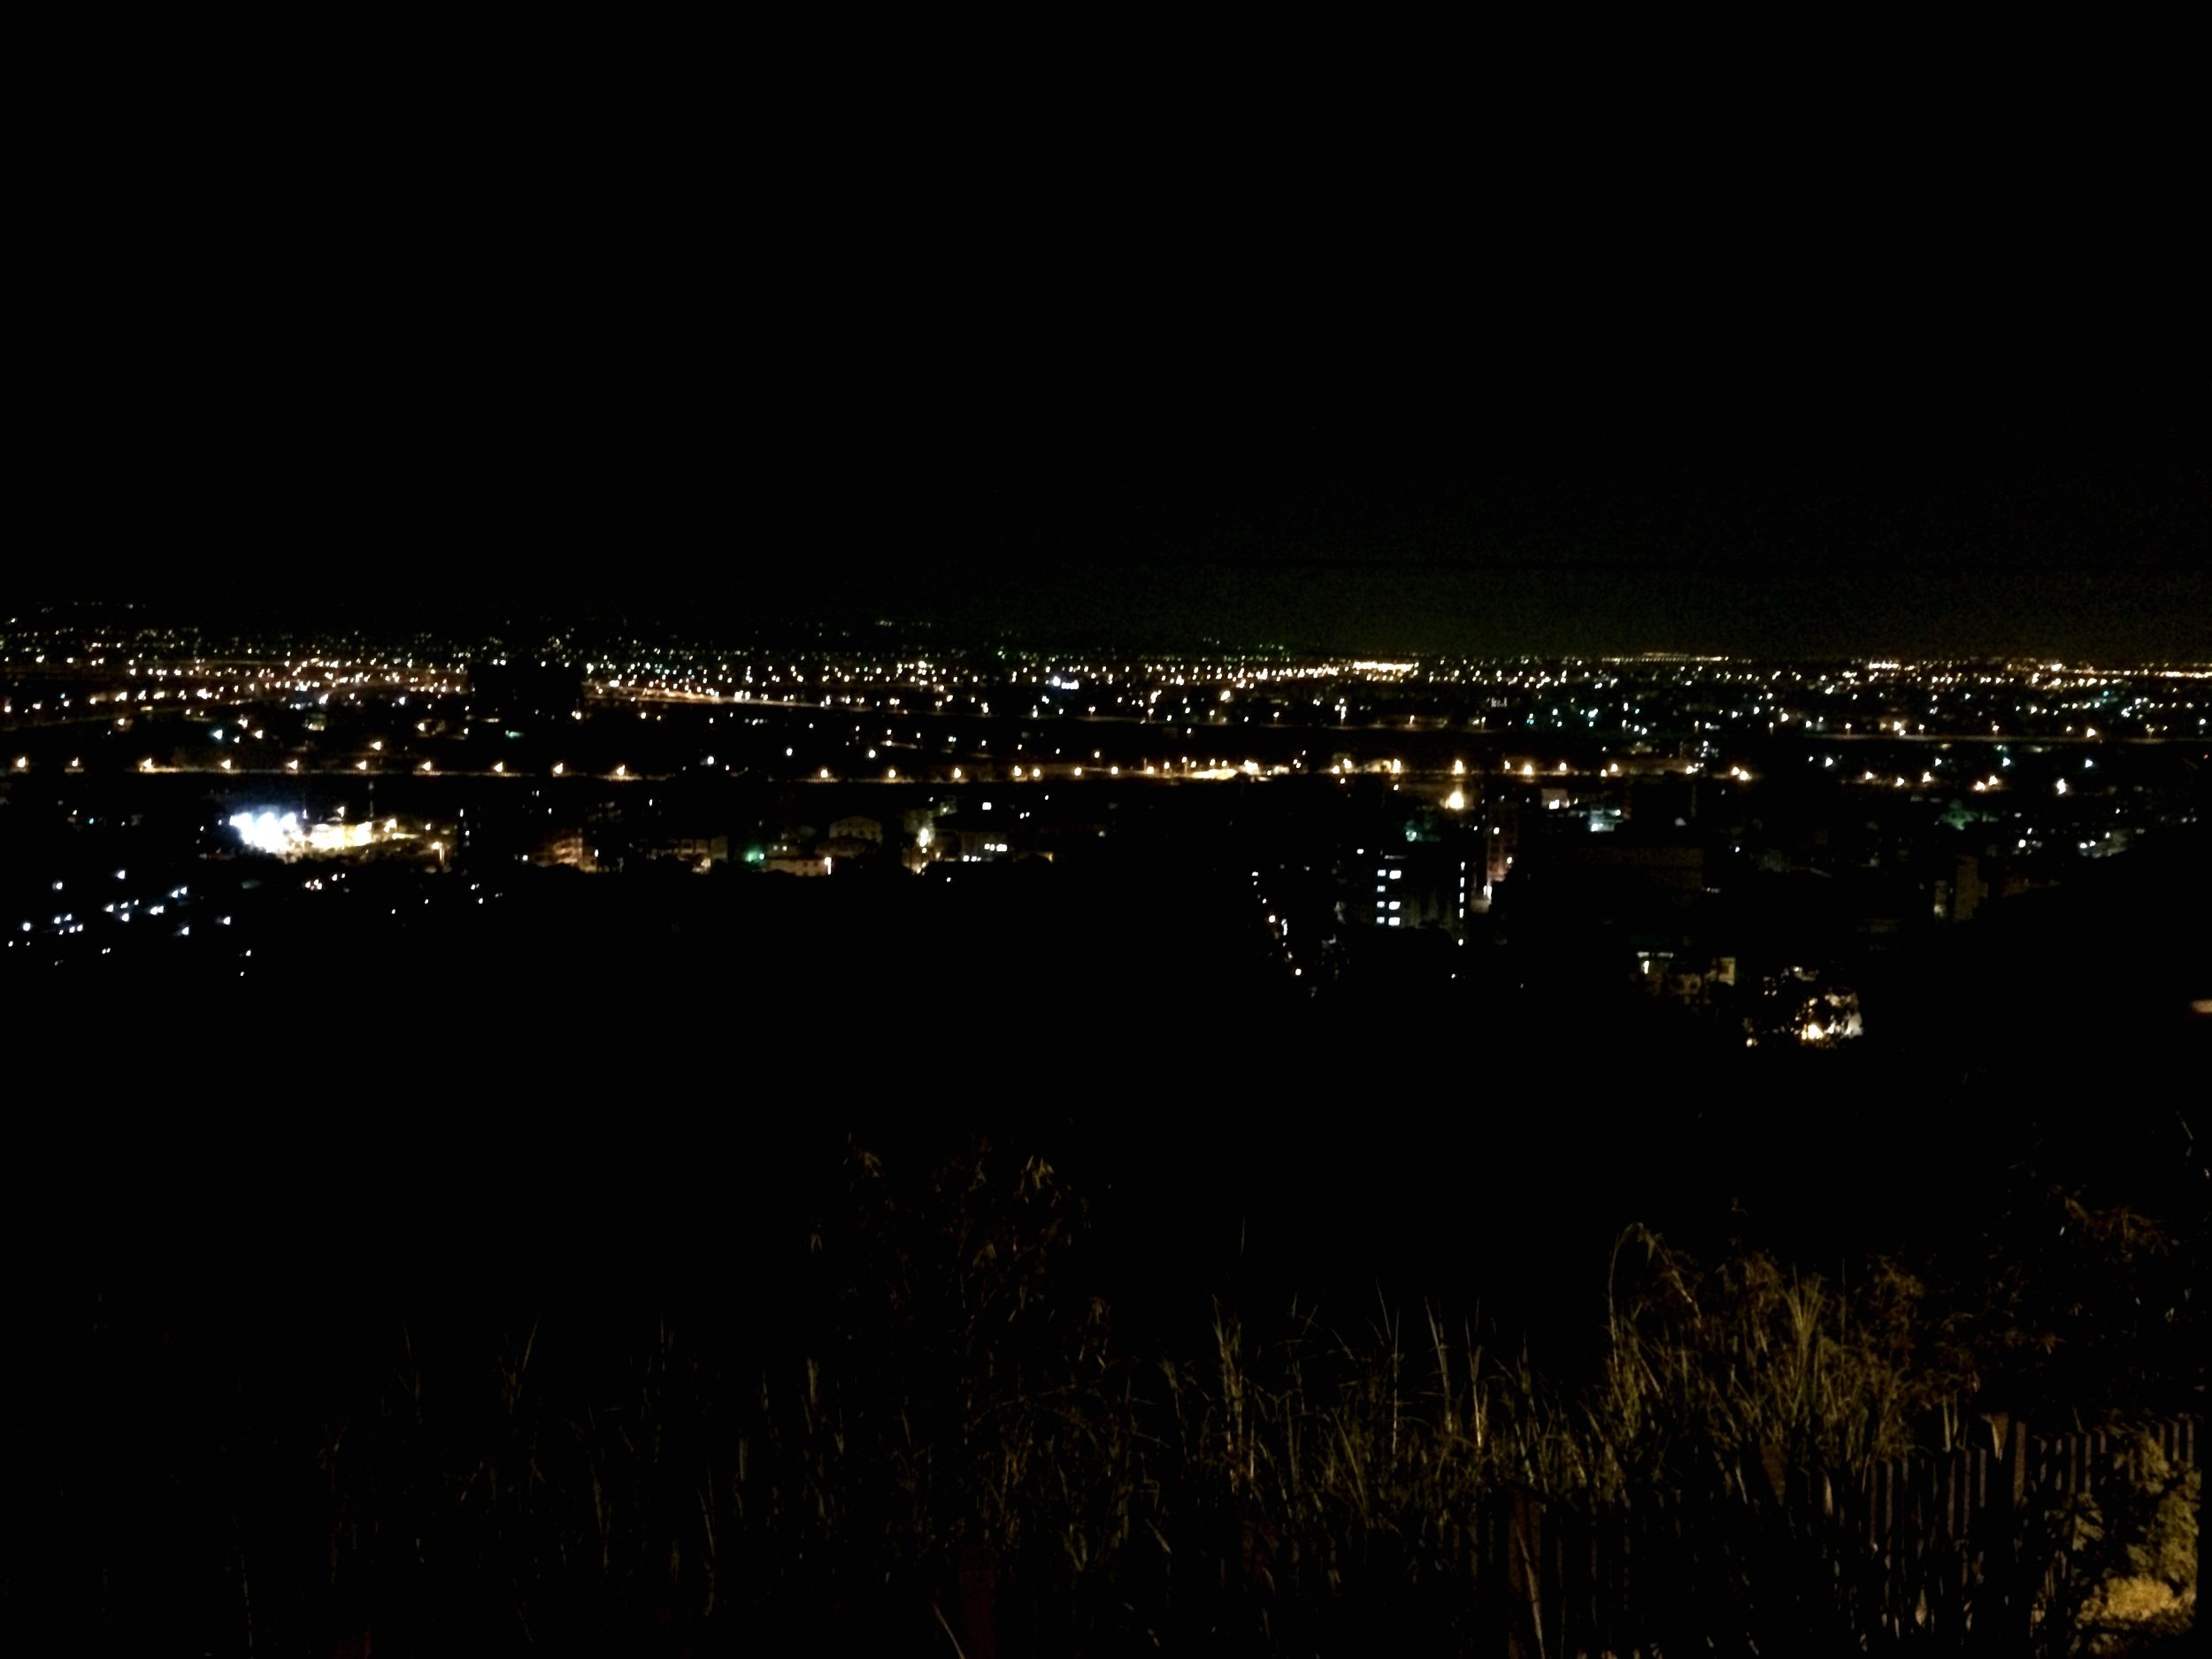 香草味 Night Lights City Lights Night View Night My View Cold Days Enjoying The View Enjoying Life